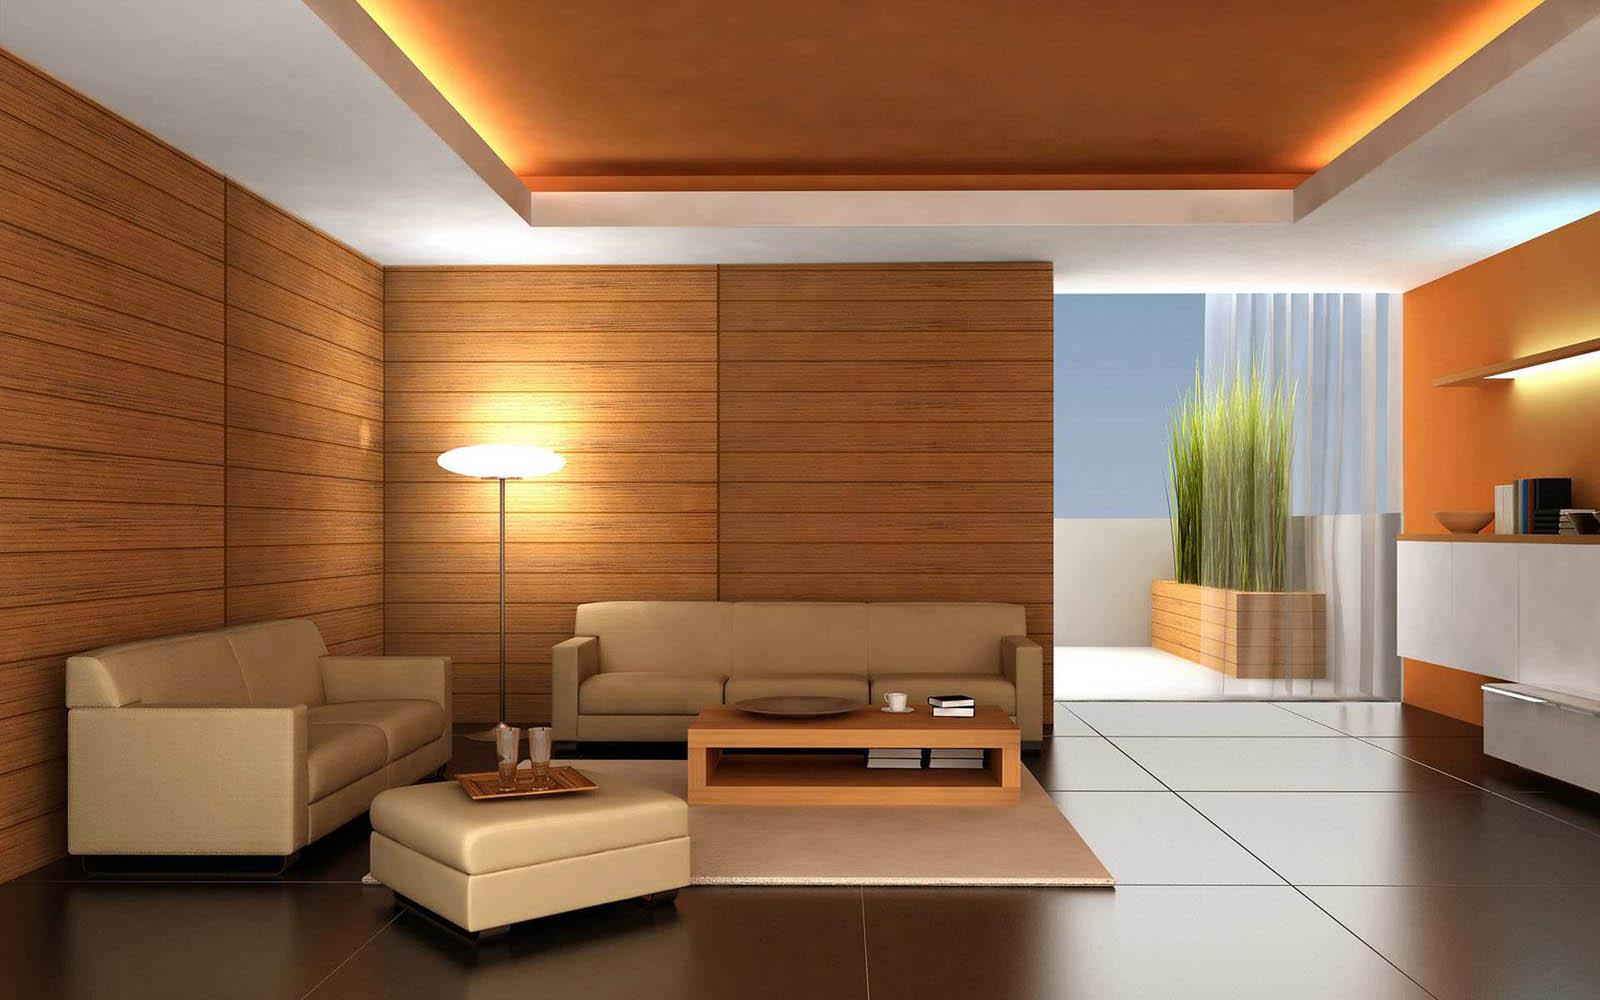 48 Wallpaper For Living Room On Wallpapersafari